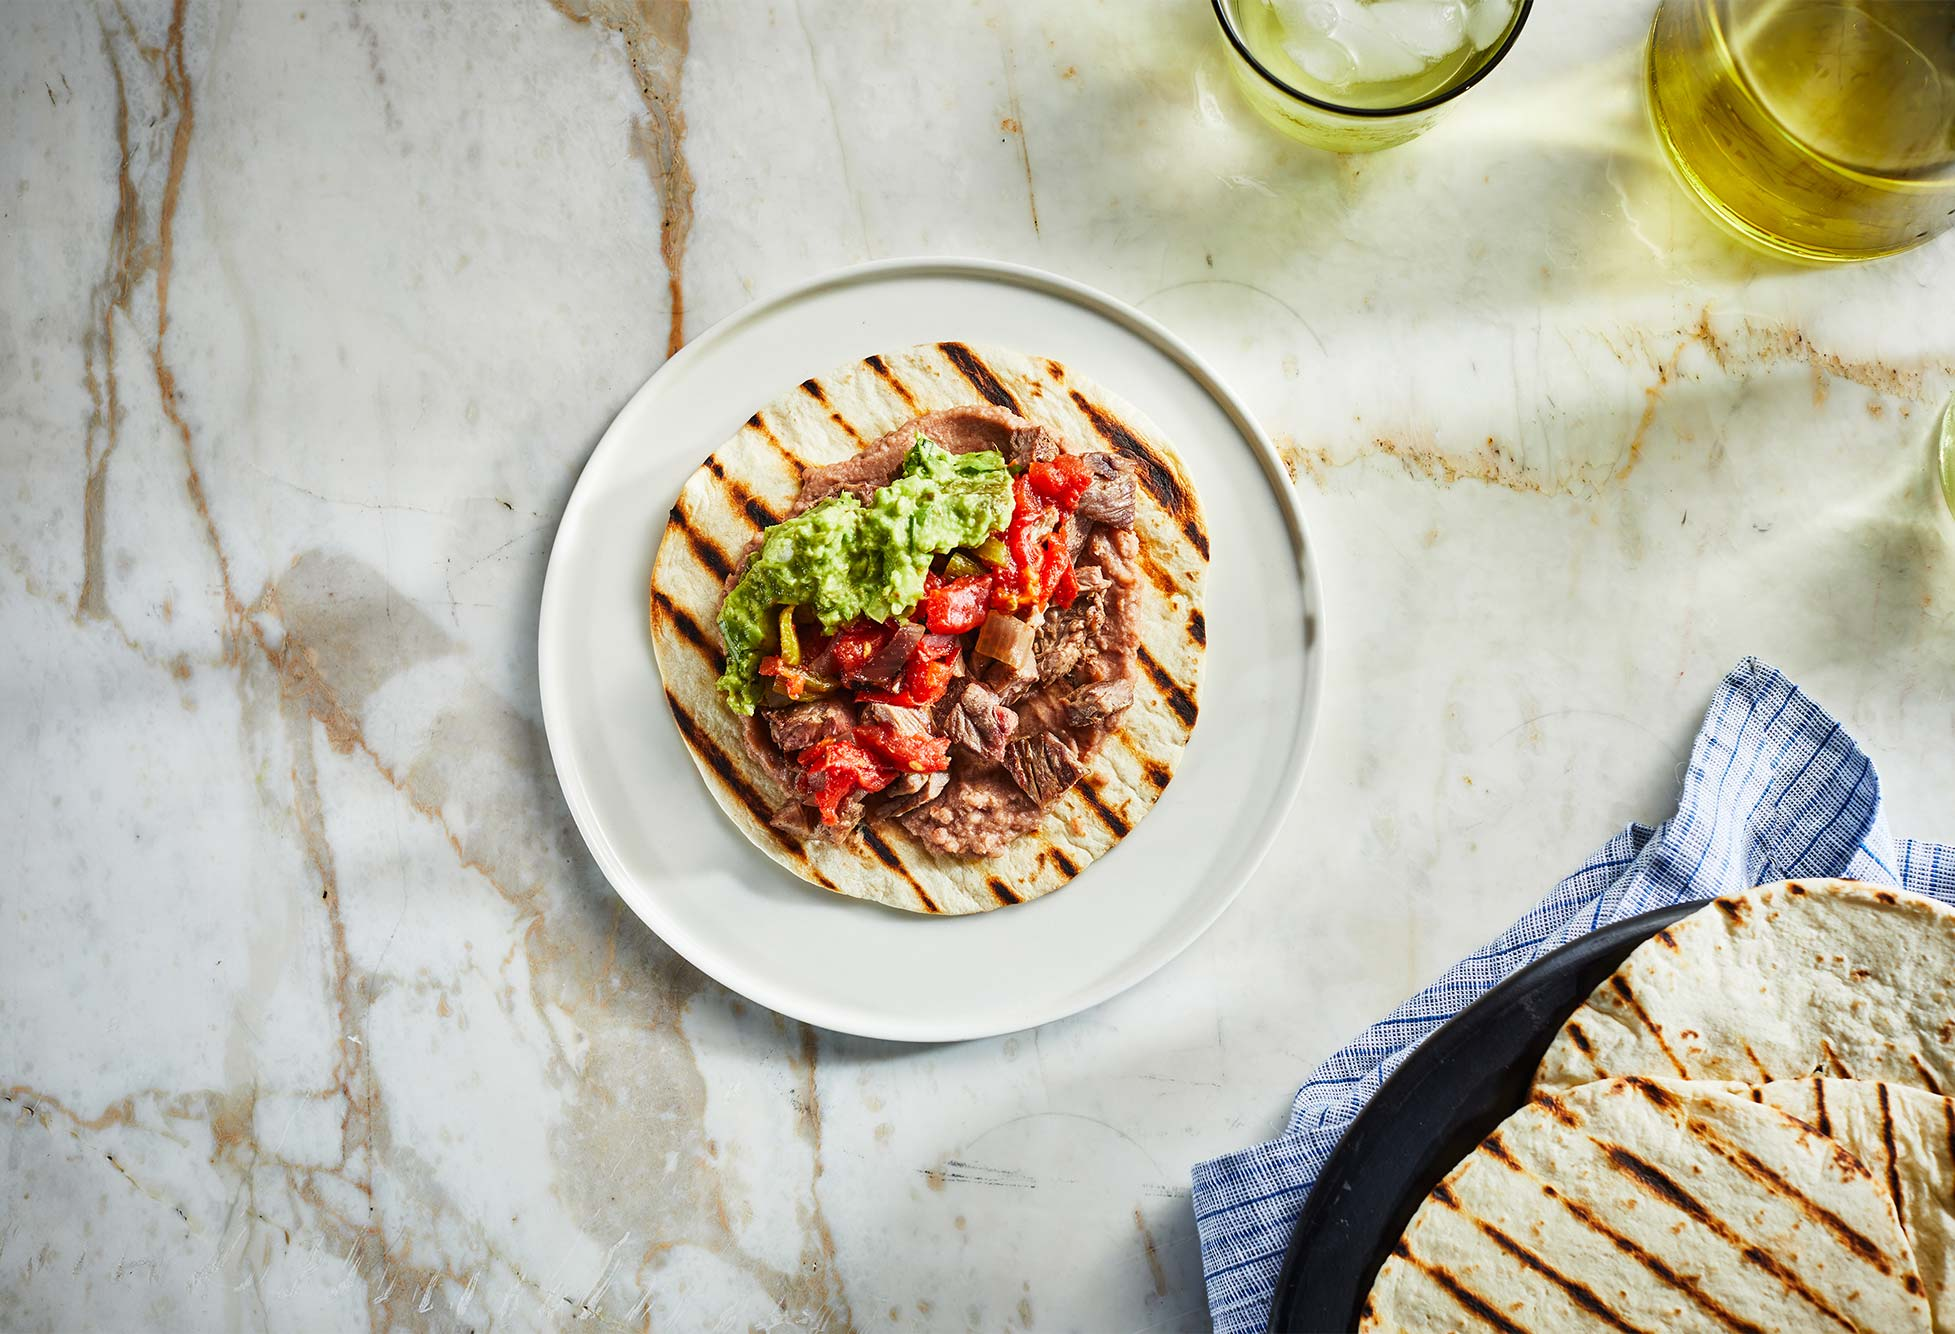 Sonora style carne asada tacos